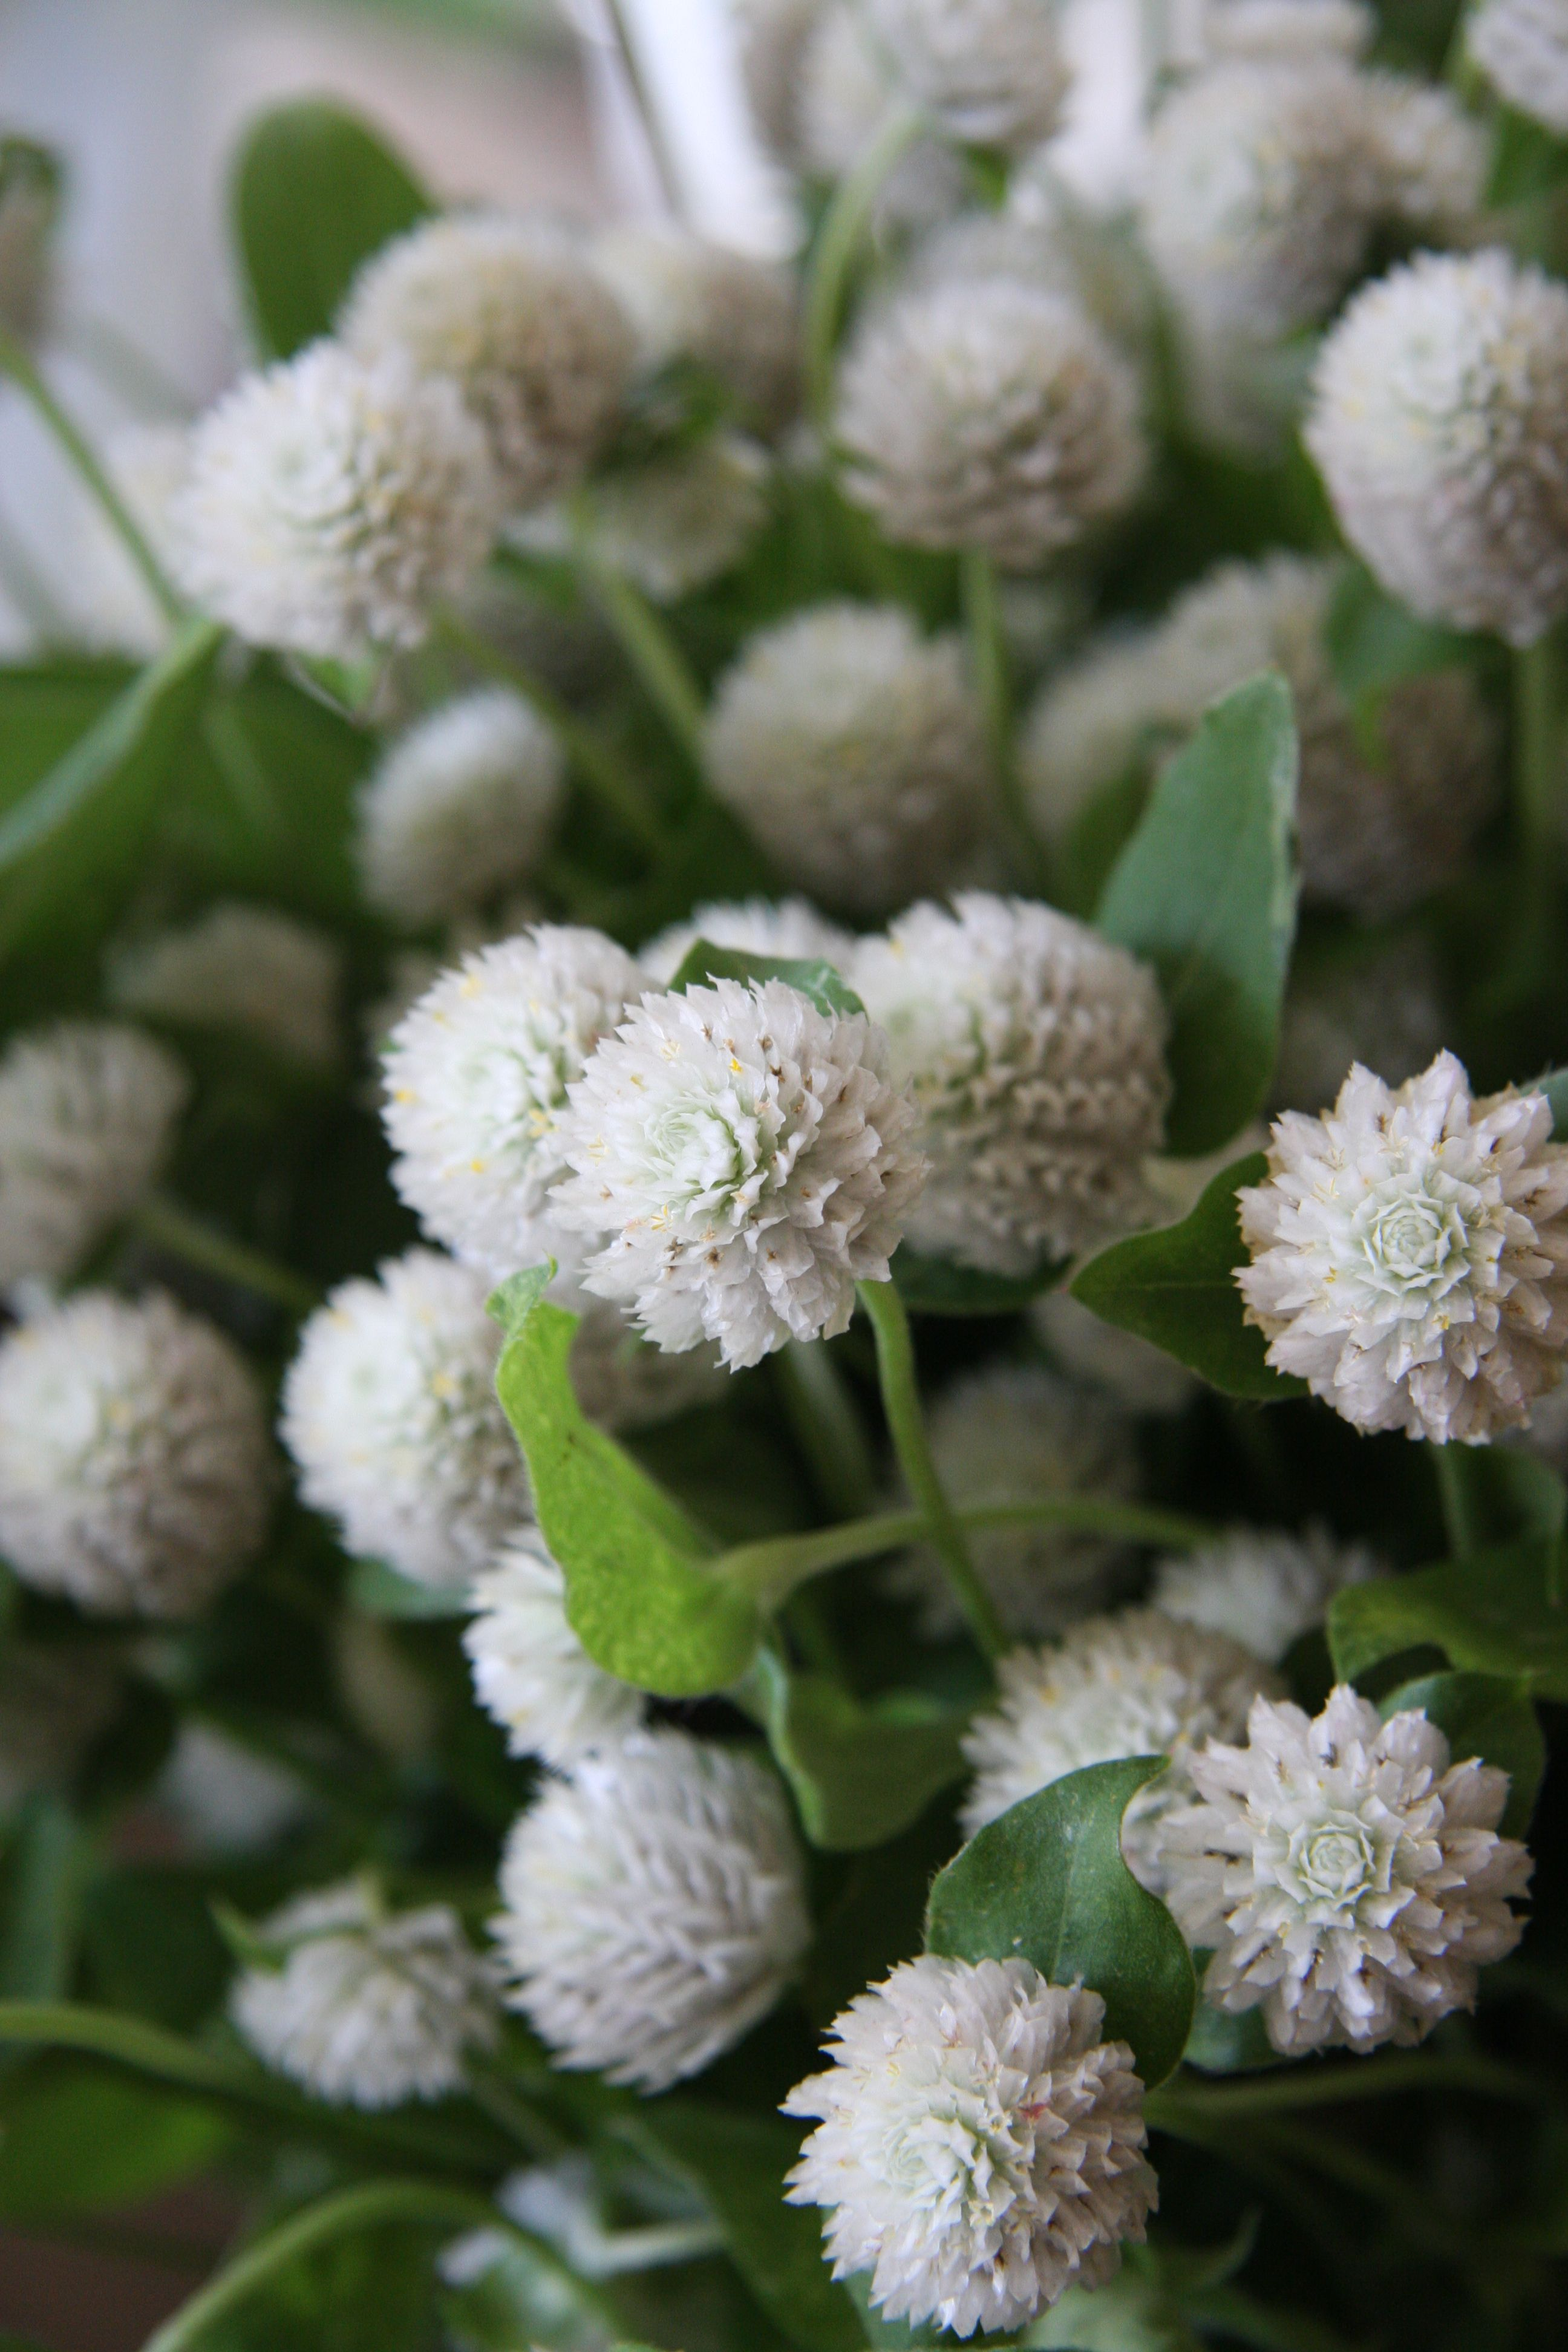 White Gomphrena globosa, commonly known as Globe Amaranth